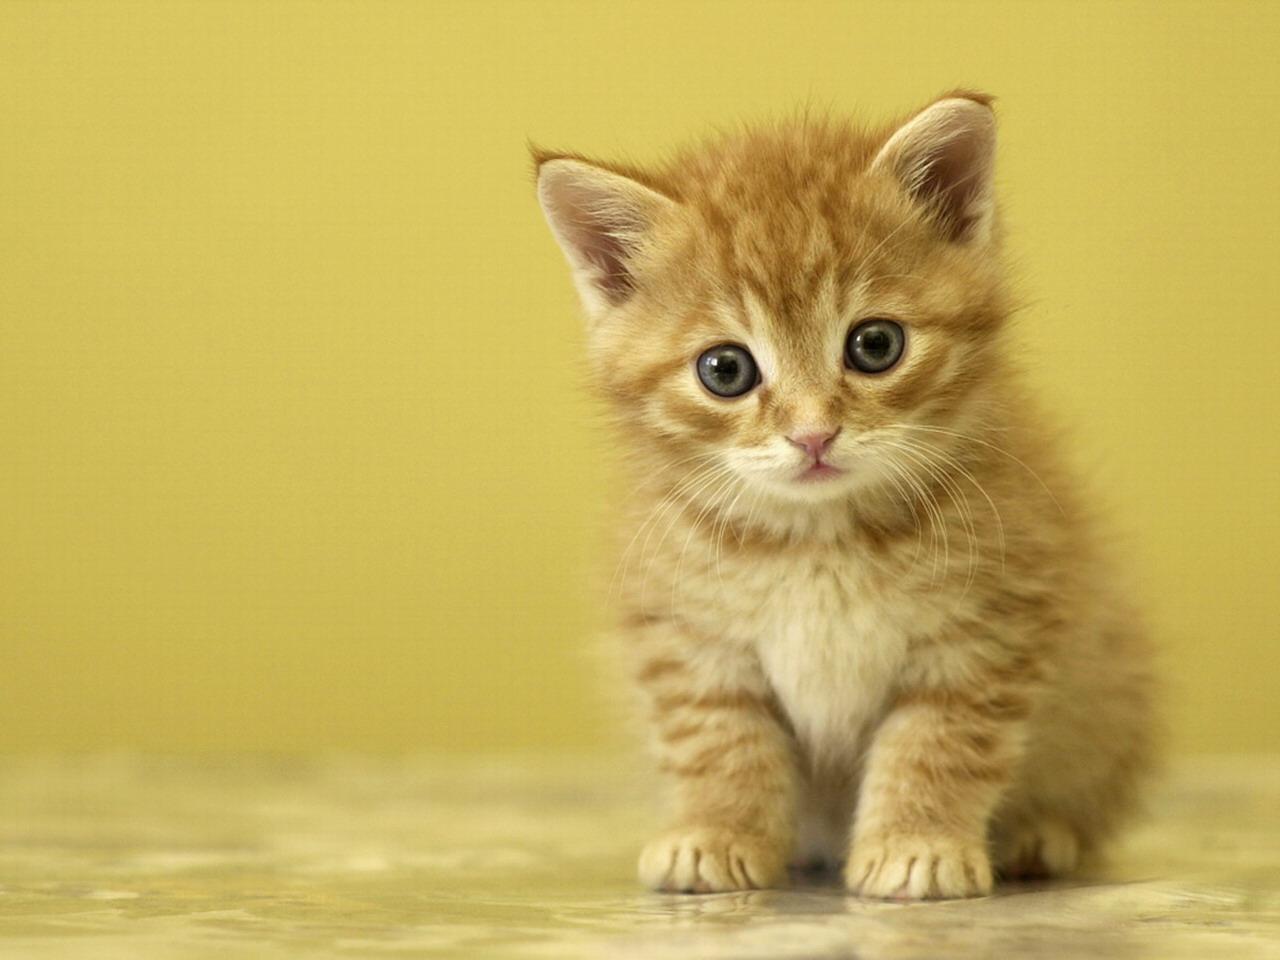 Cute Baby Cats Wallpaper Kolarkoler Com Litle Pups 1280x960